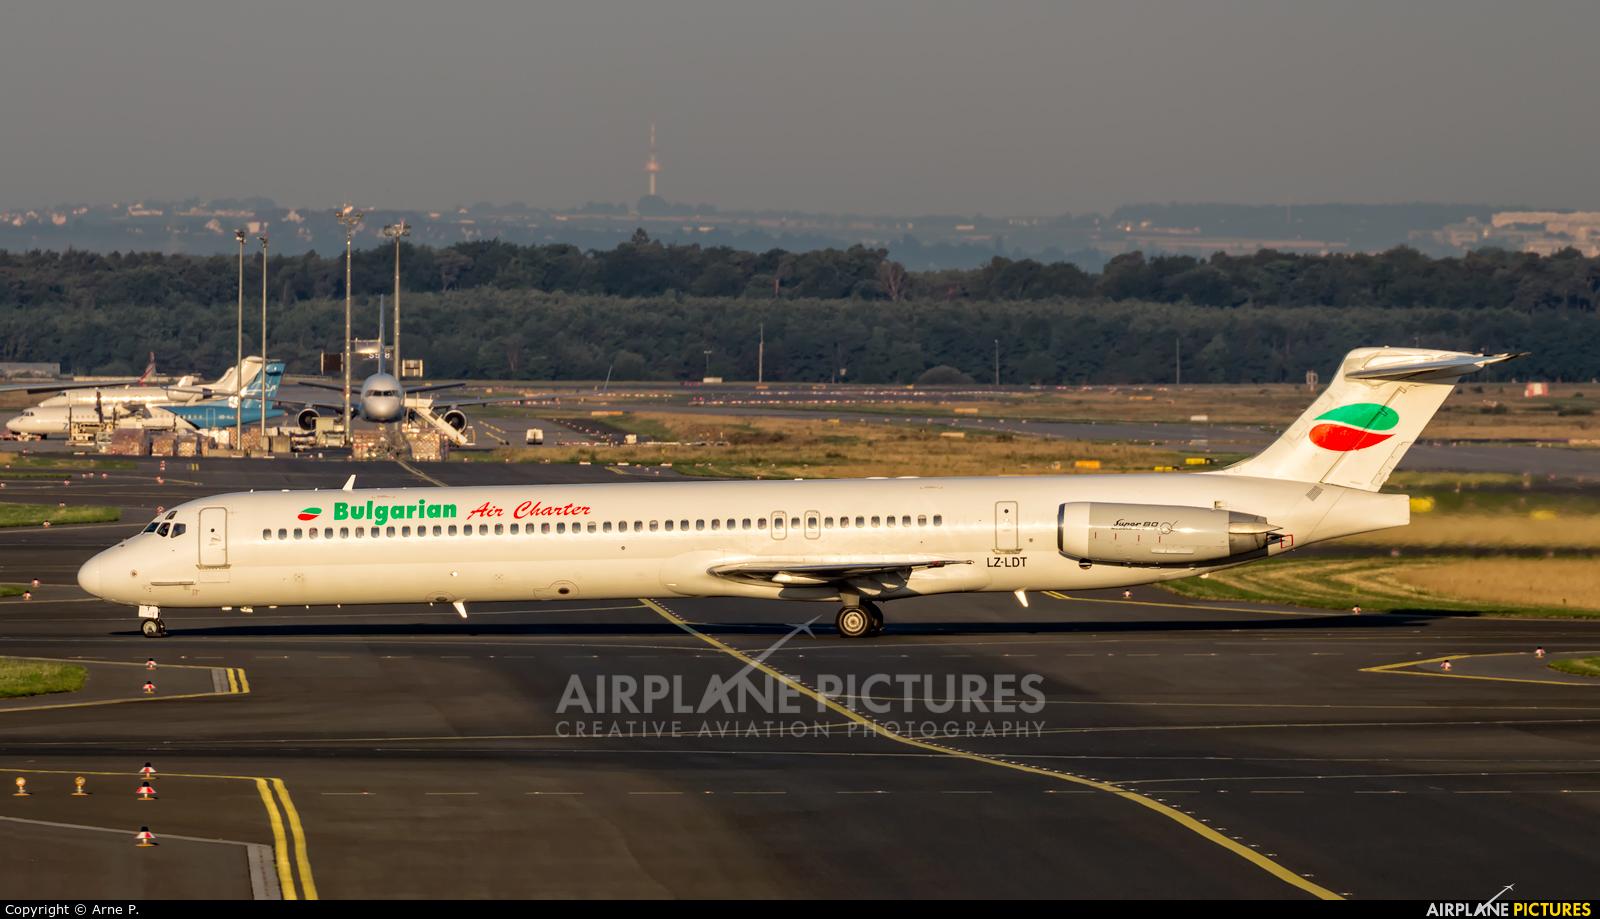 Bulgarian Air Charter LZ-LDT aircraft at Frankfurt